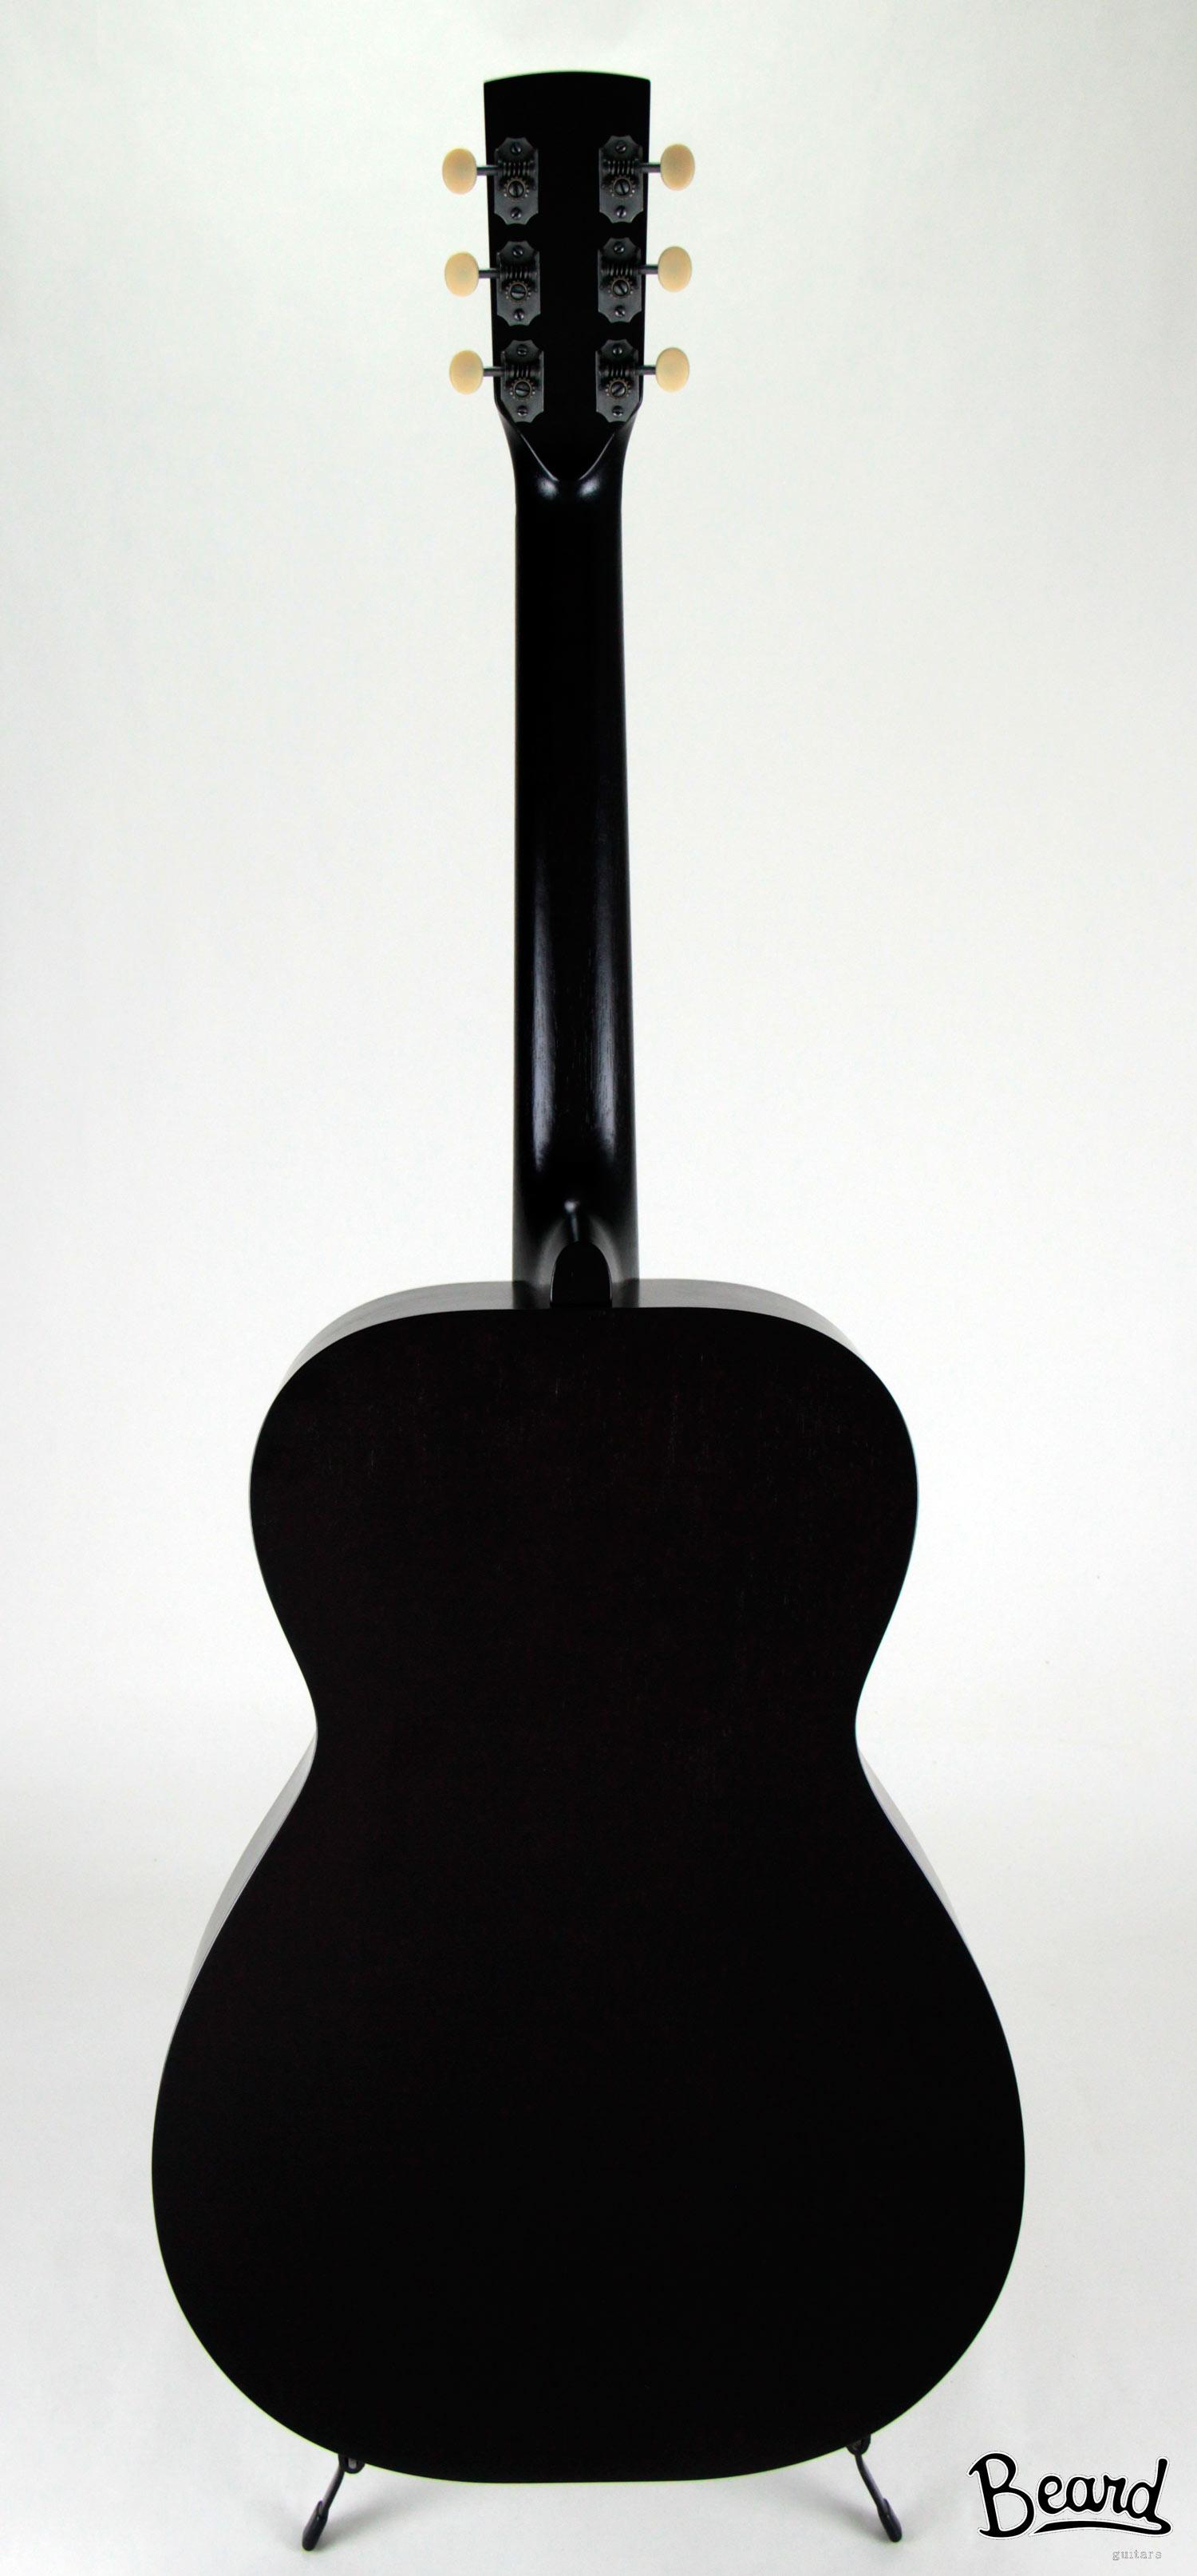 Beard Deco Phonic™ Model 47